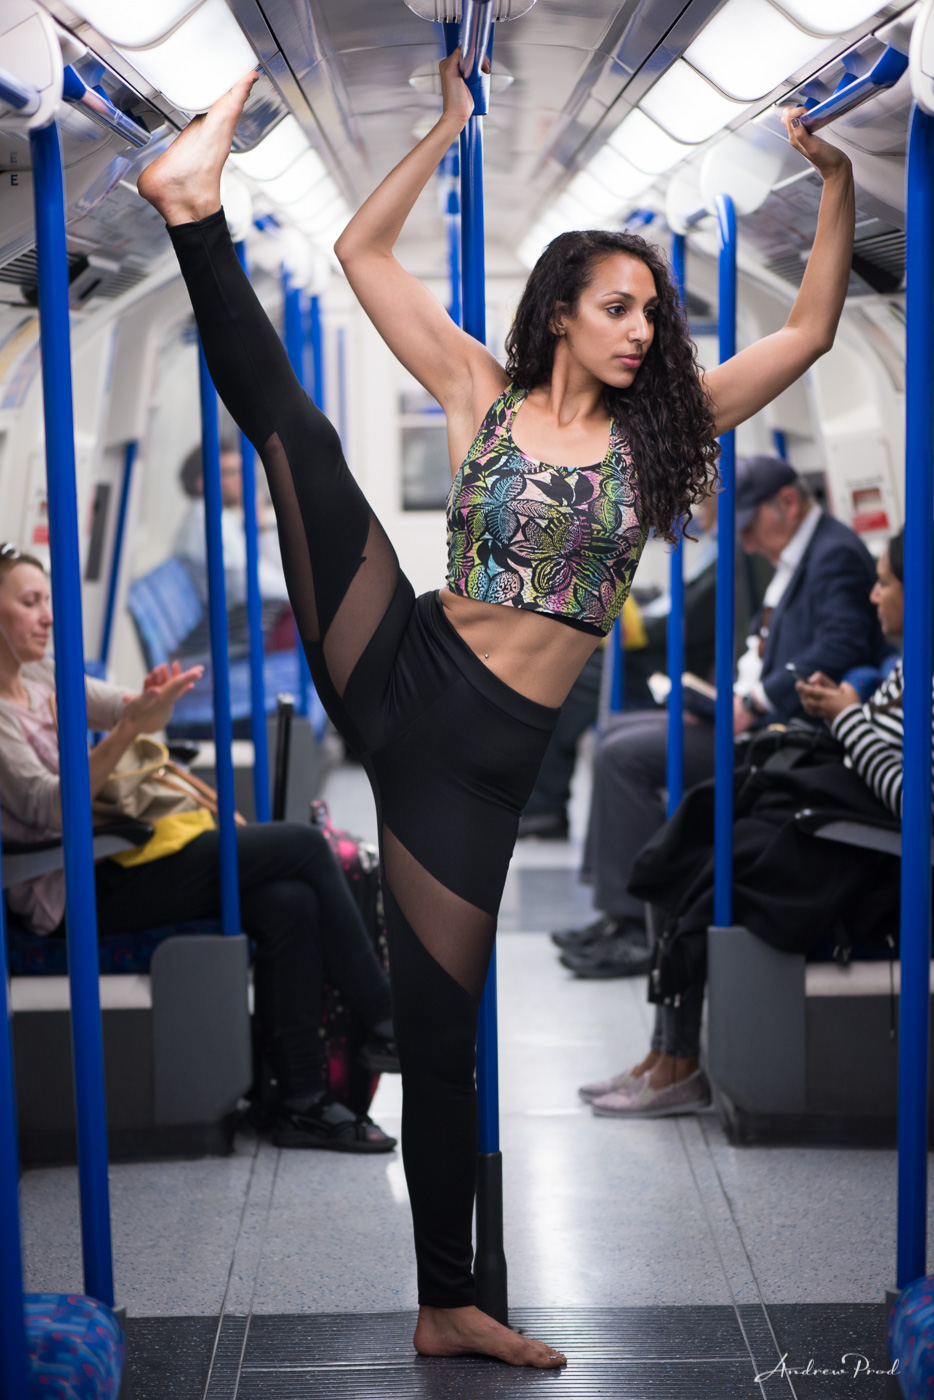 yoga-london-train